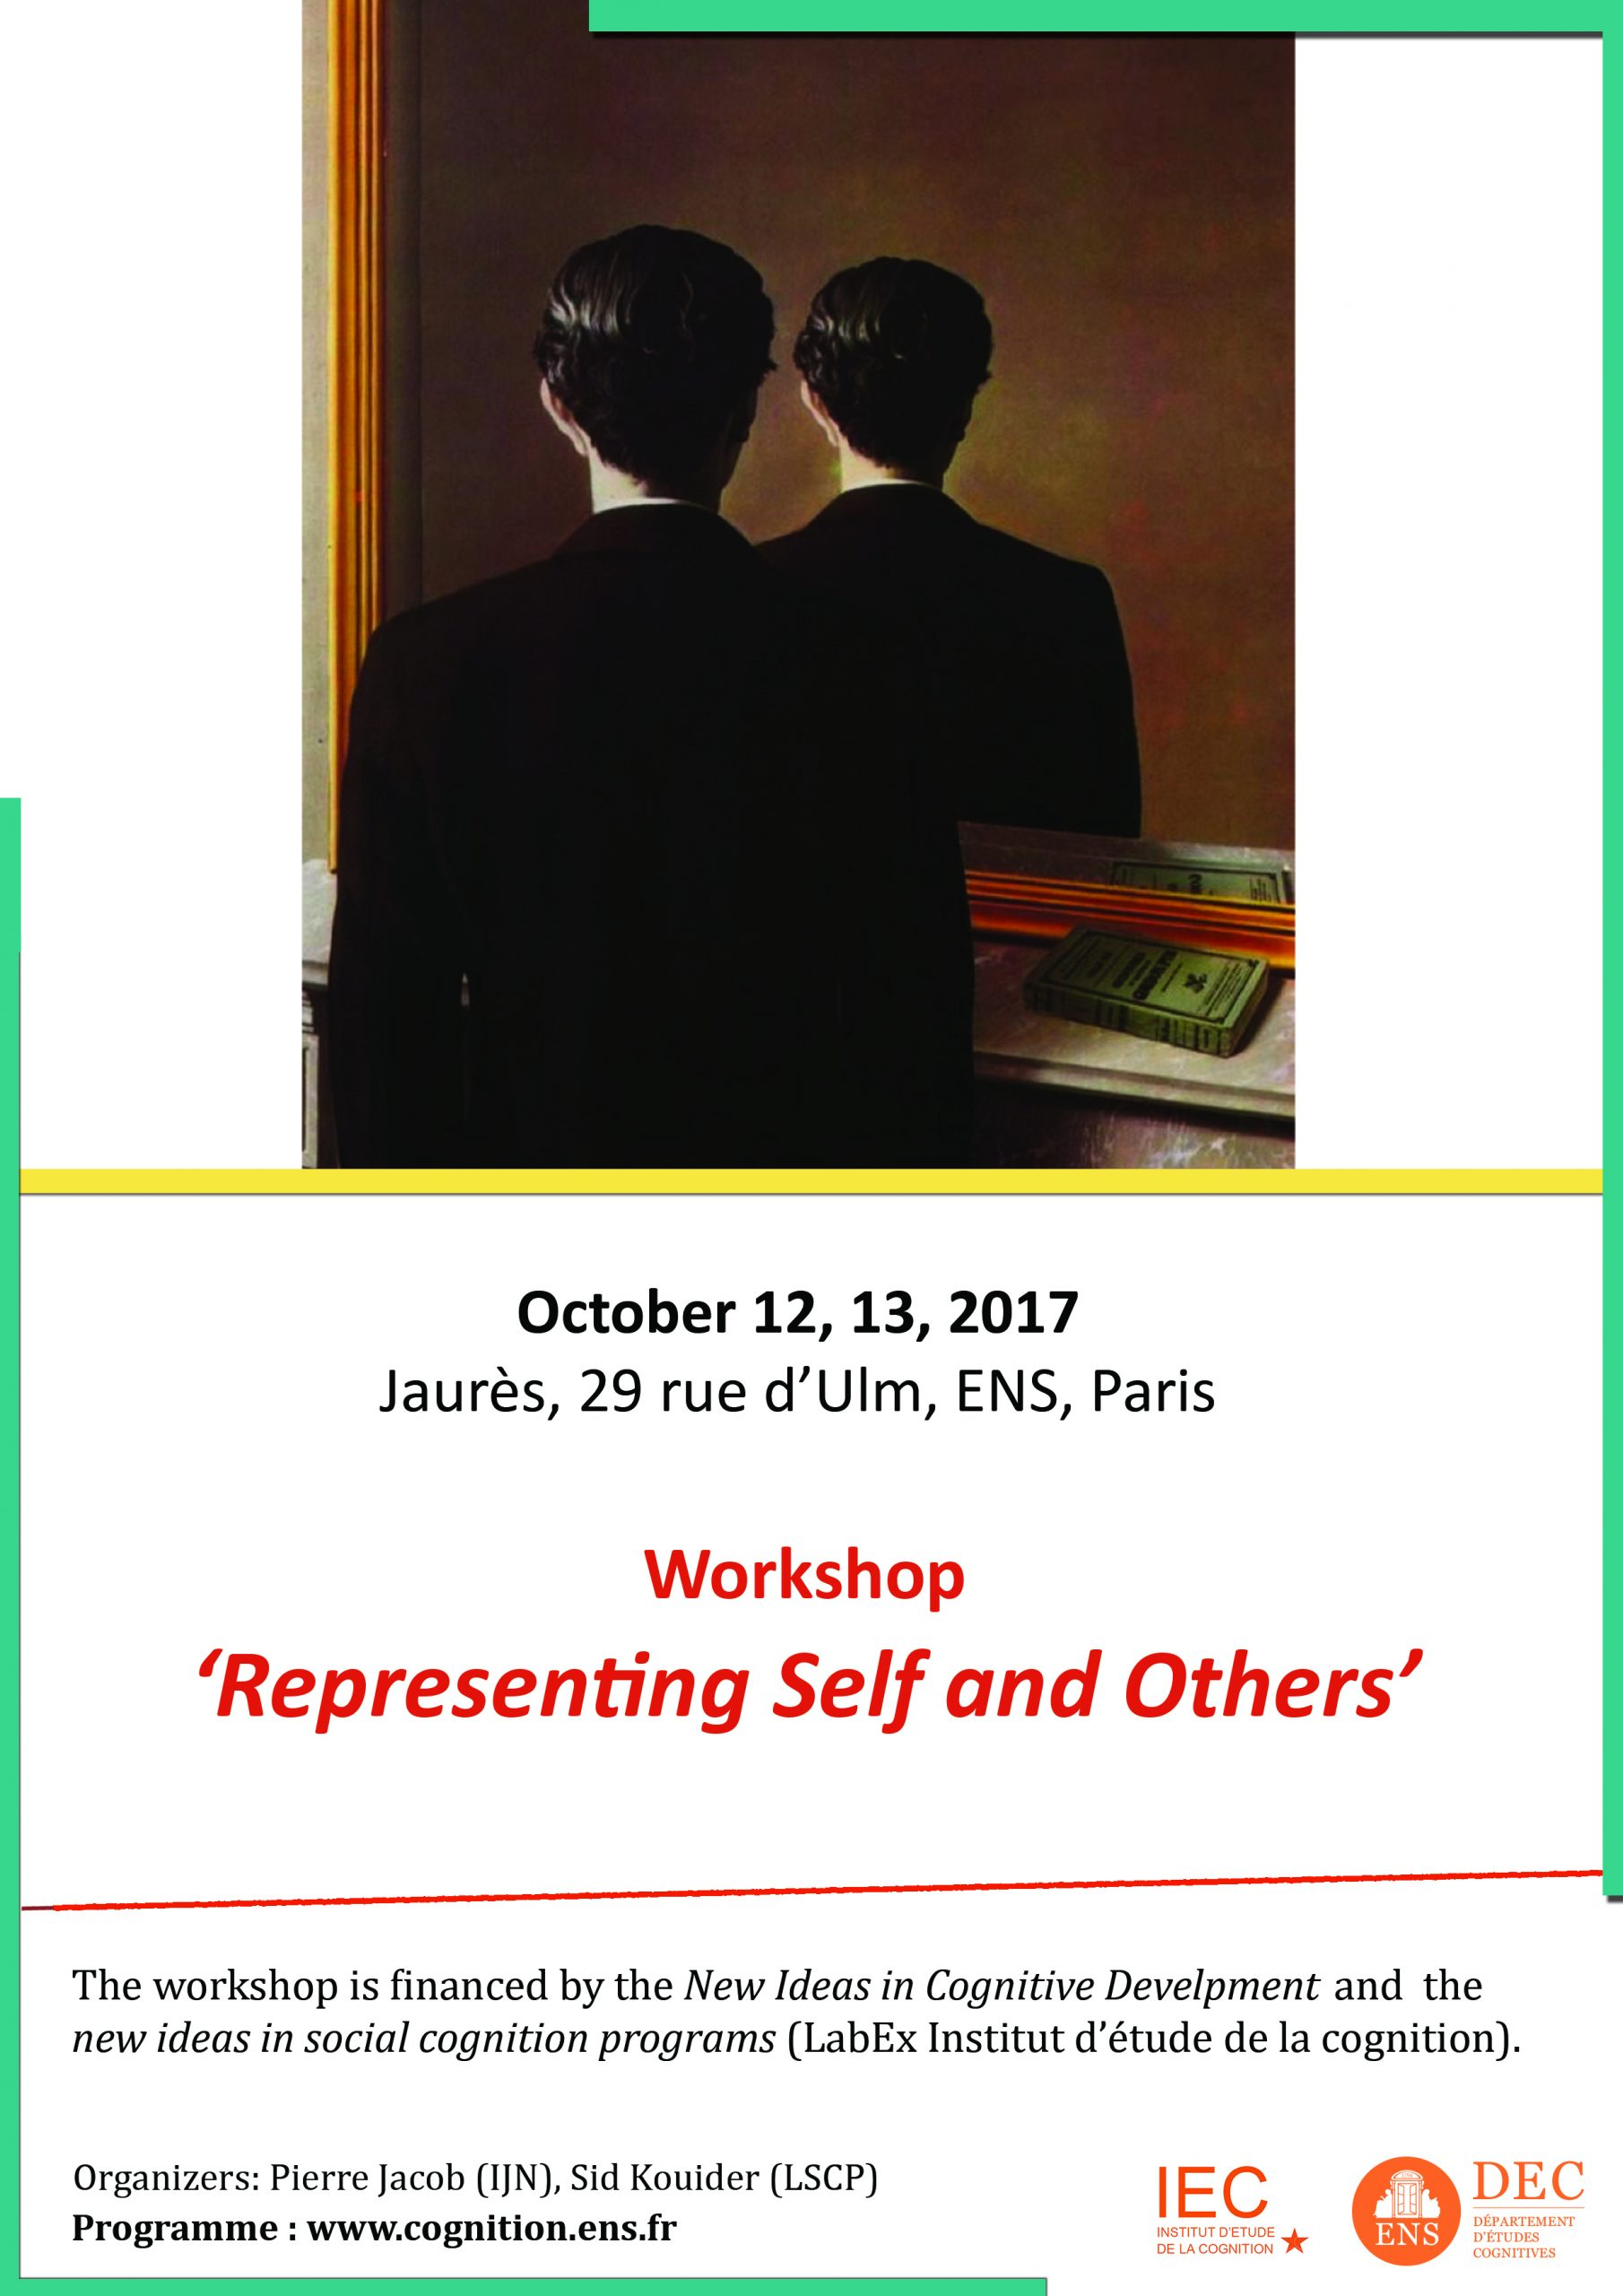 Calendar: Workshop - Representing Self And Others   Dec encequiconcerne Puzzle Departement